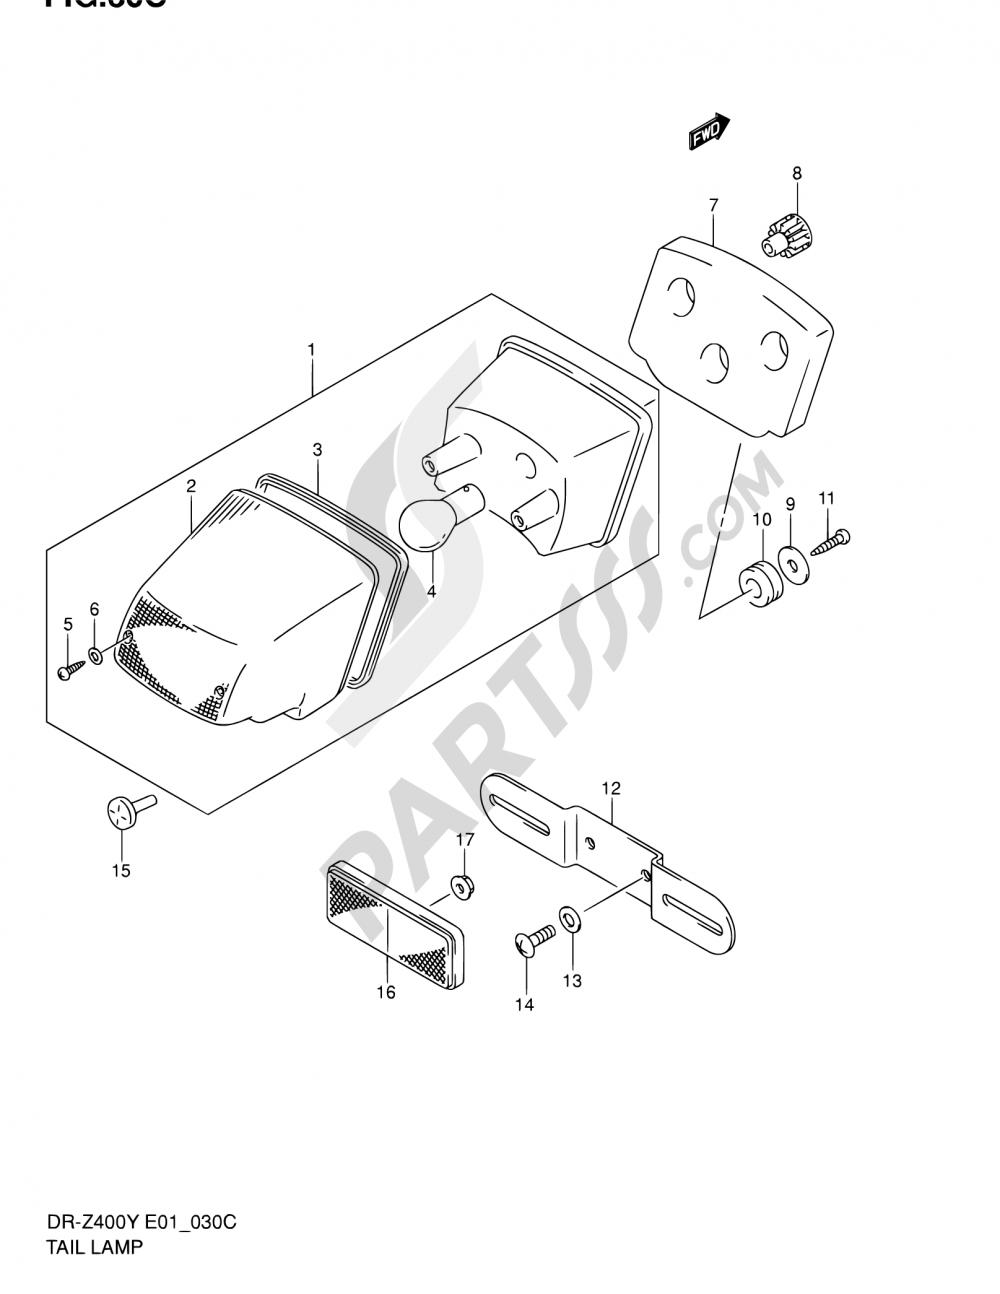 30C - TAIL LAMP (DR-Z400EY/EK1/EK2/EK3/EK4 E24) Suzuki DR-Z400E 2002